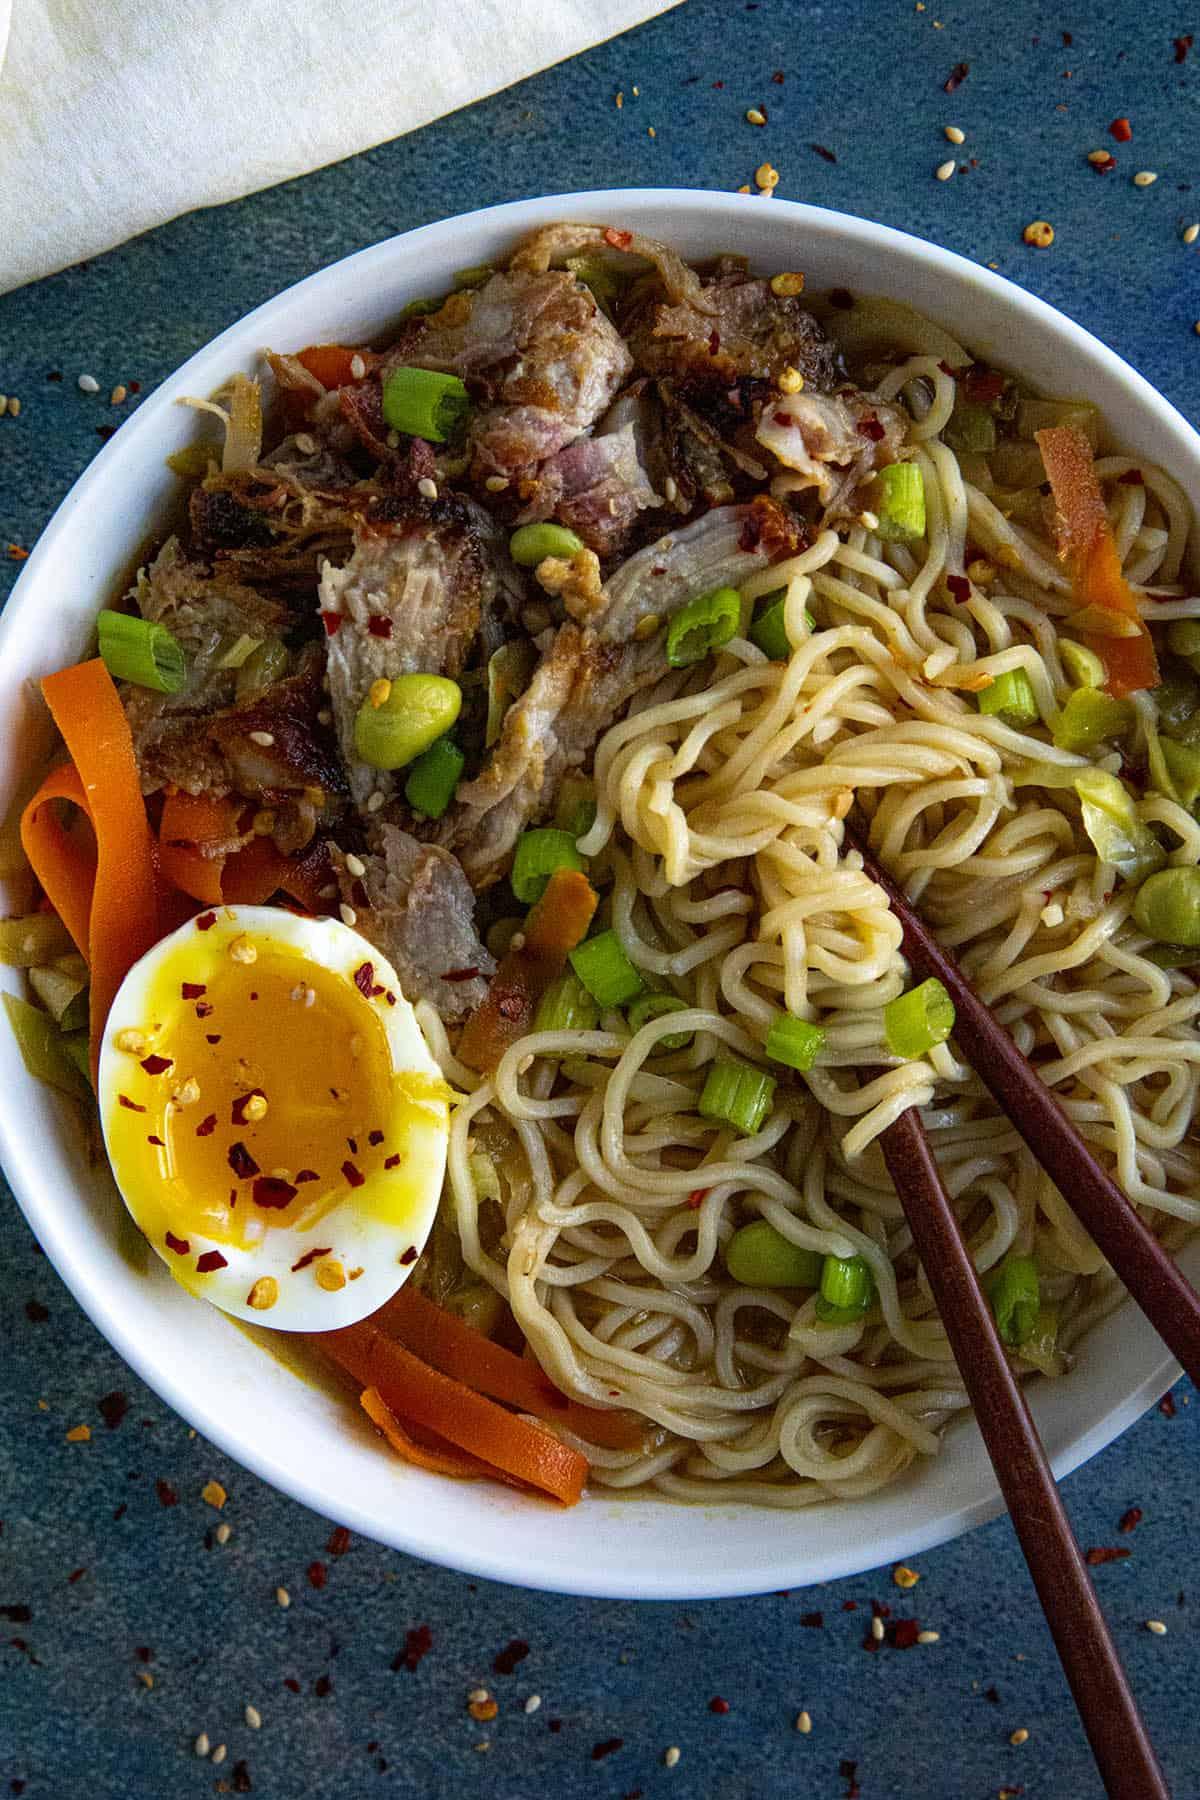 Miso Ramen in a bowl with chopsticks